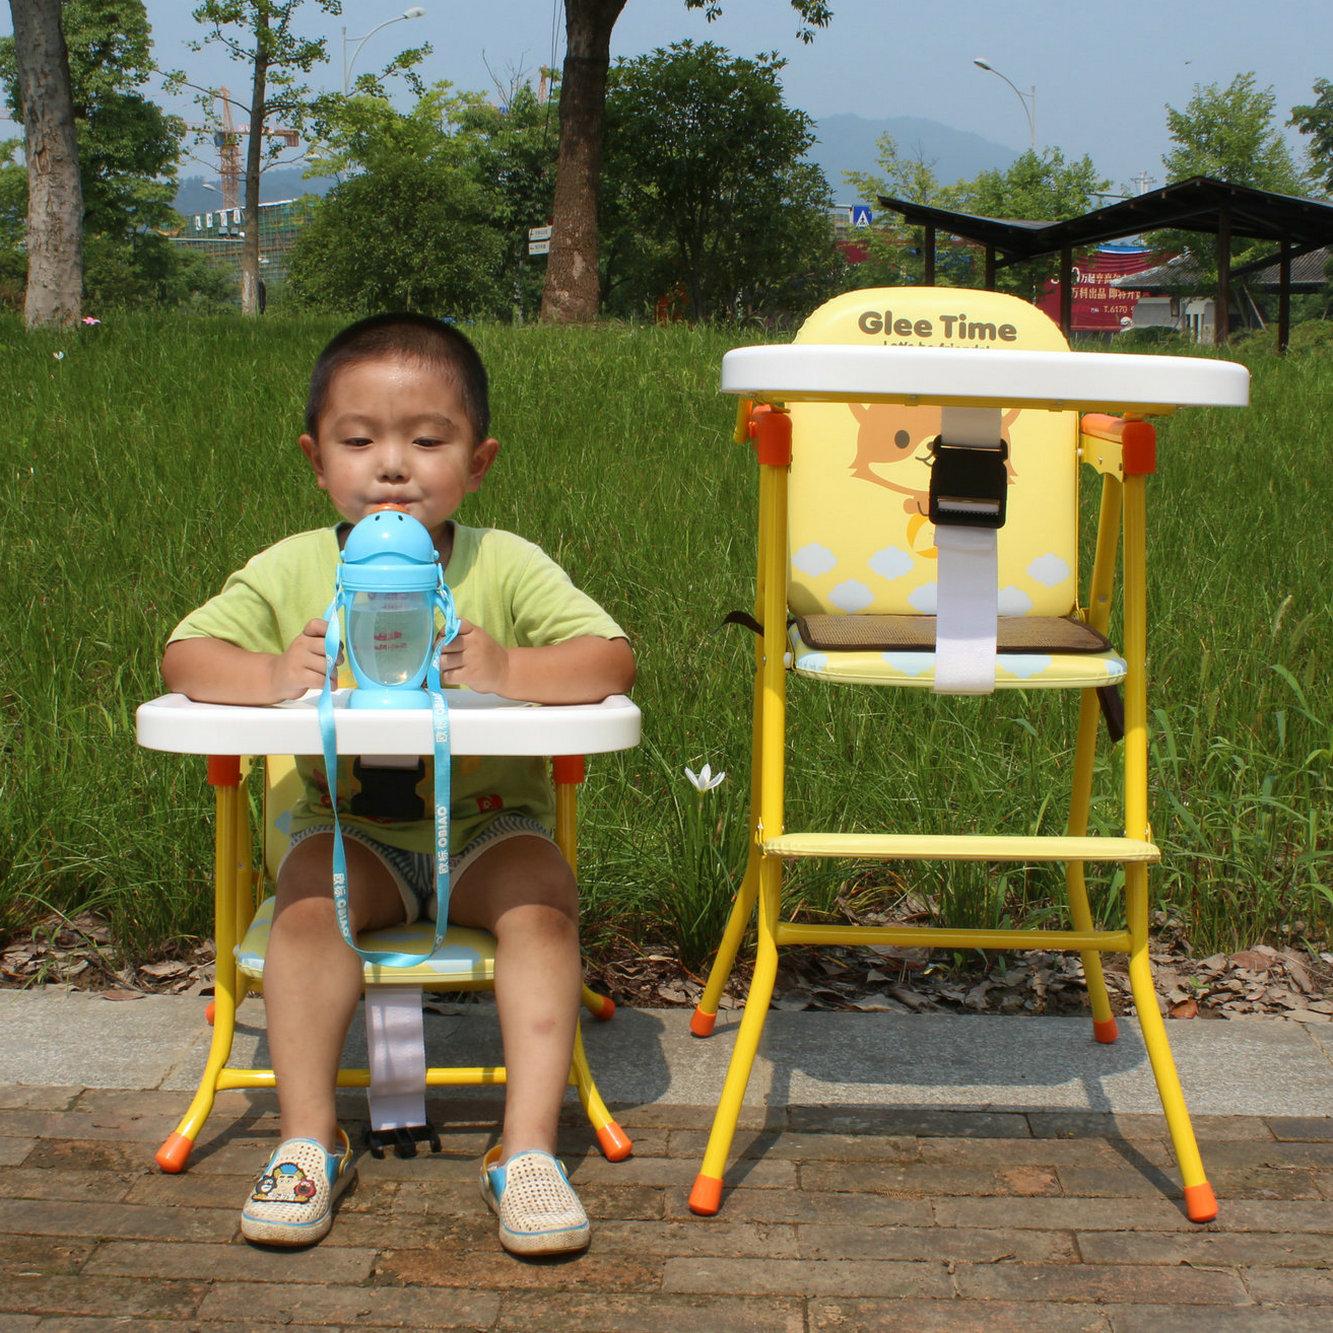 Multi-Function Children Dinning Chair, Folding Baby High Chair, Portable Baby Feeding Chair